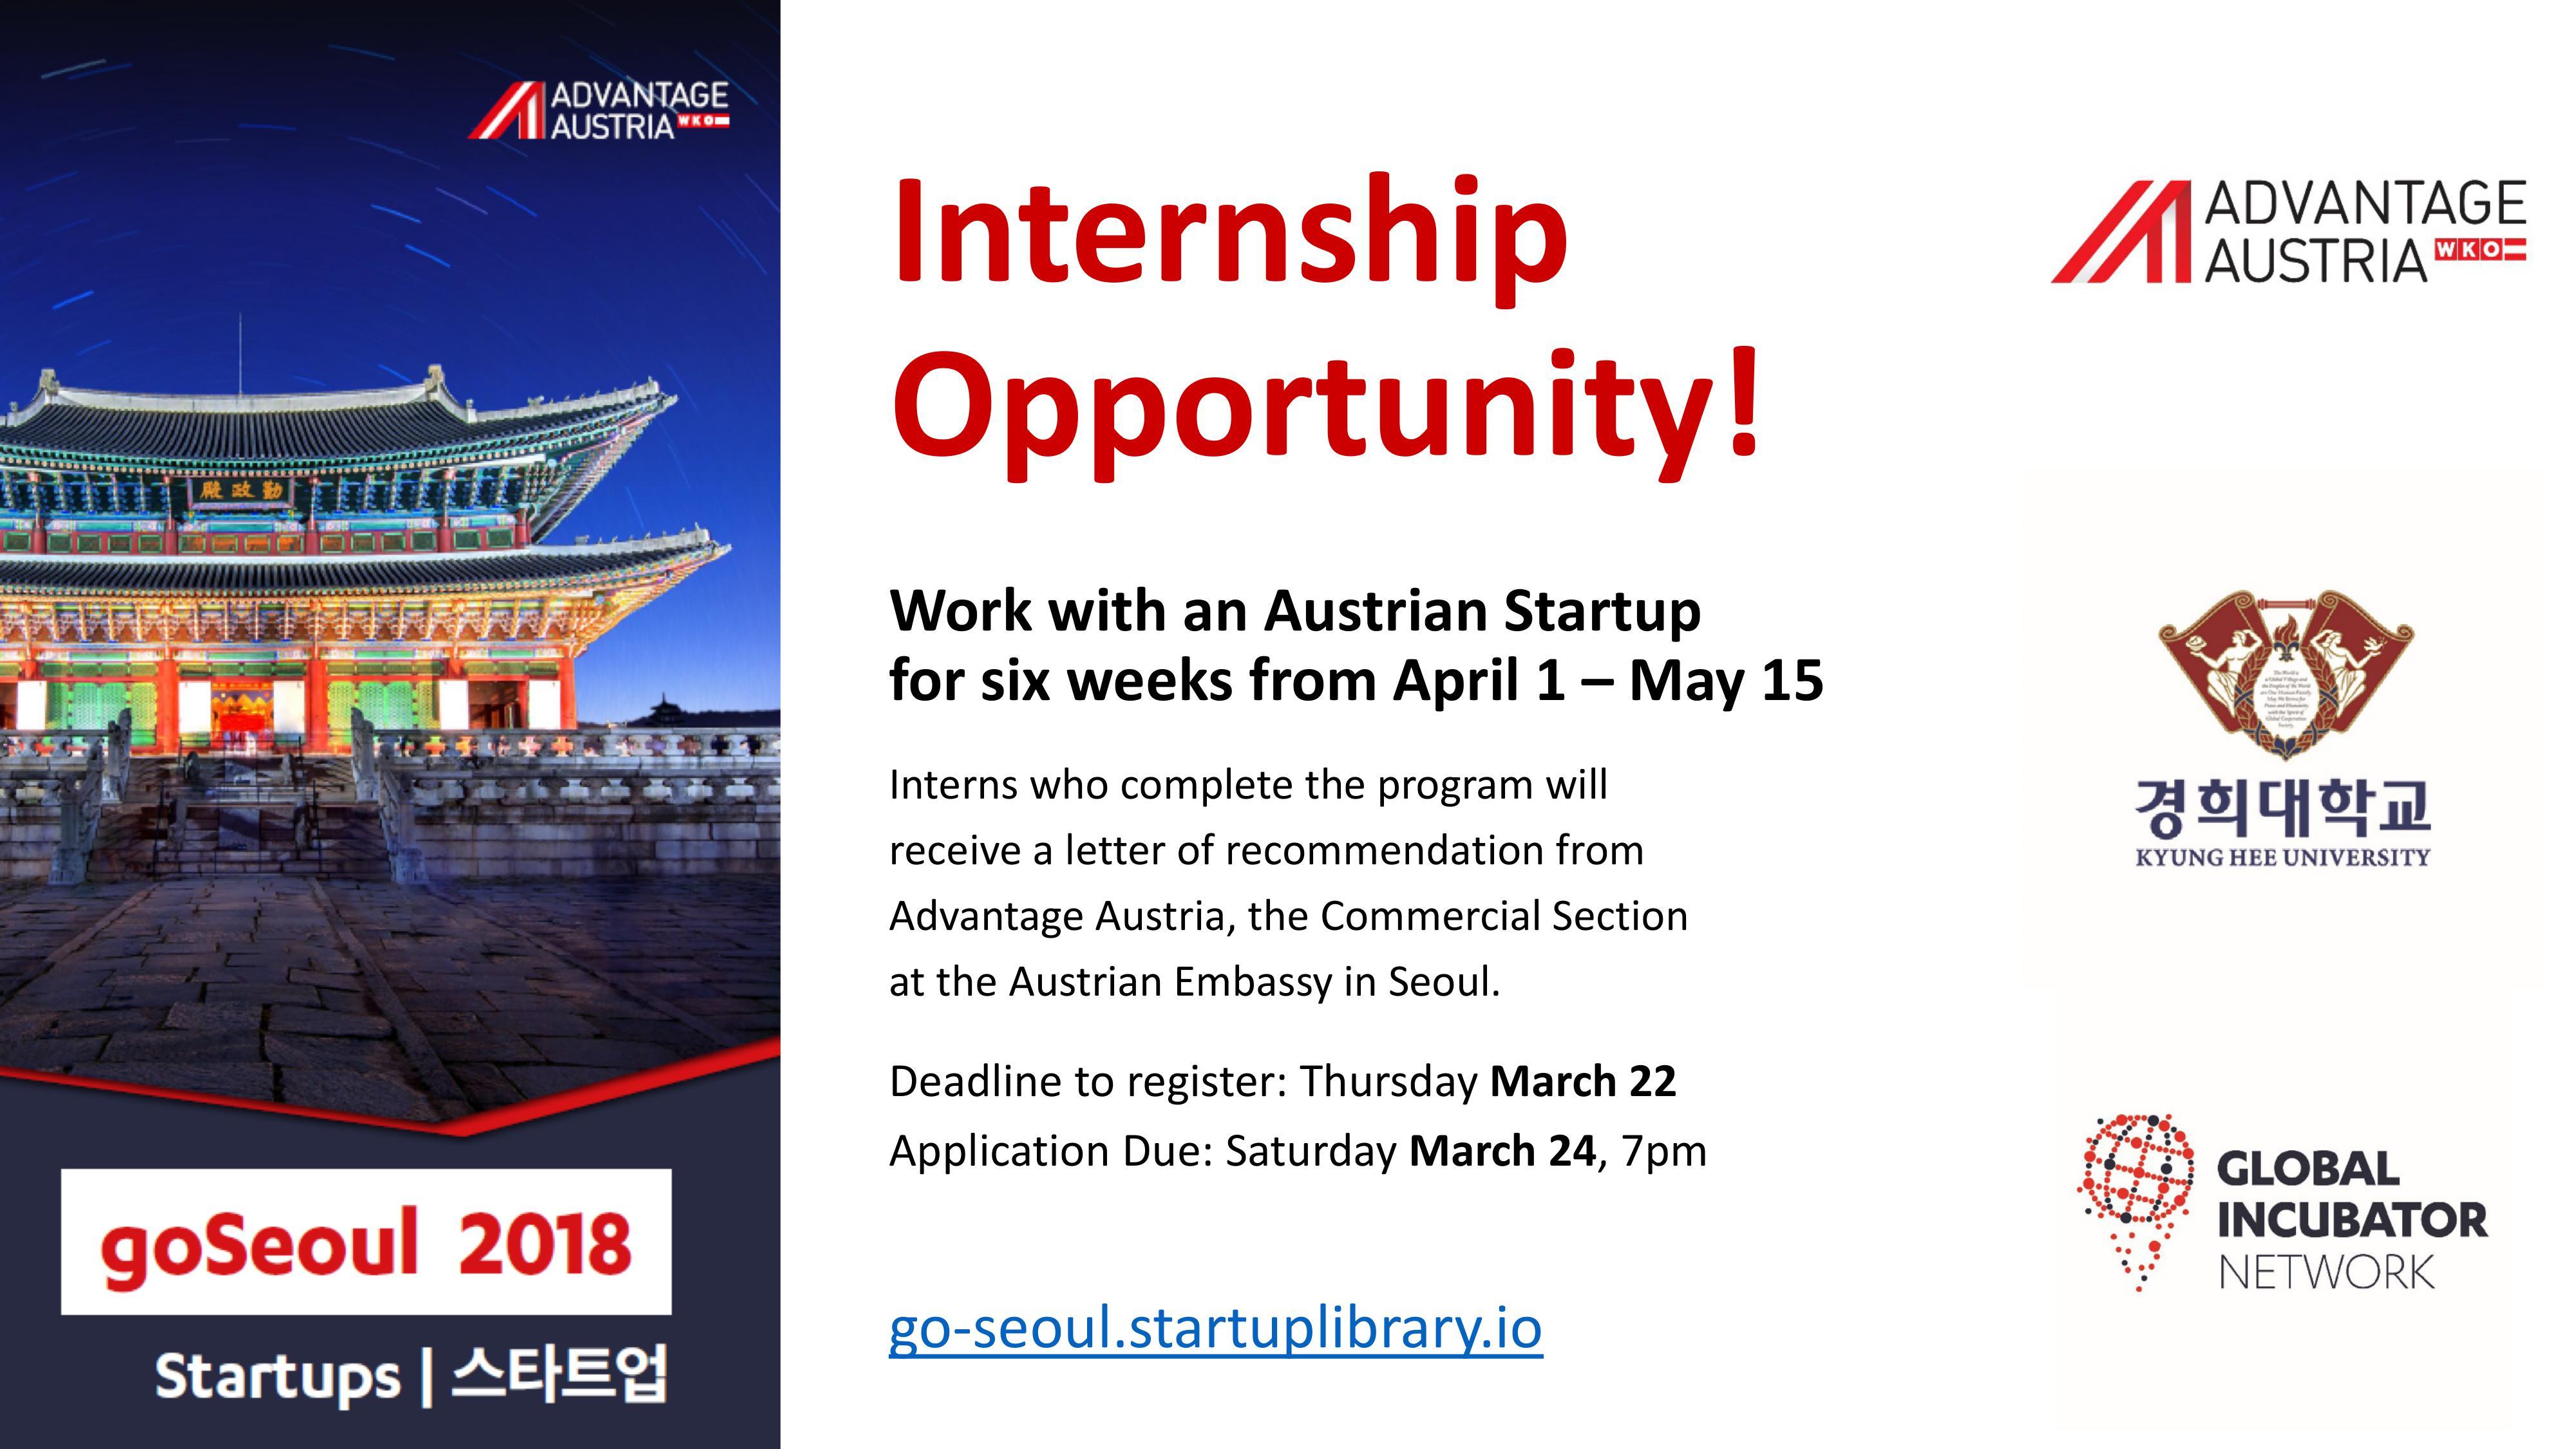 goSeoul2018 Internship Opportunity.jpg